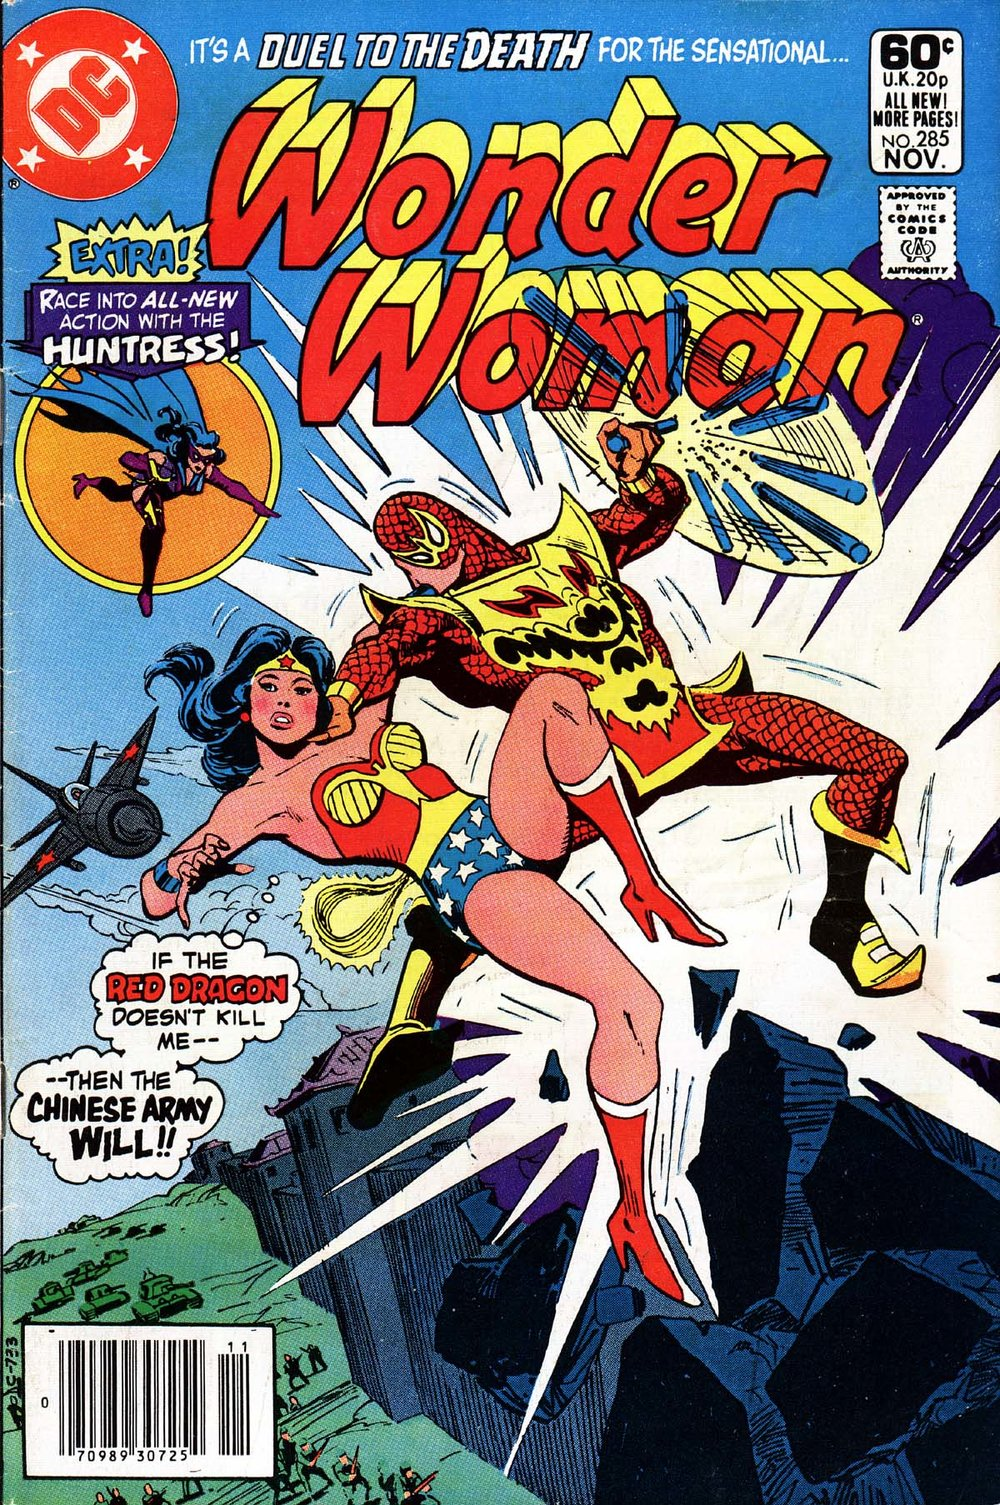 Wonder Woman (1942) #285, cover by Jose Delbo.